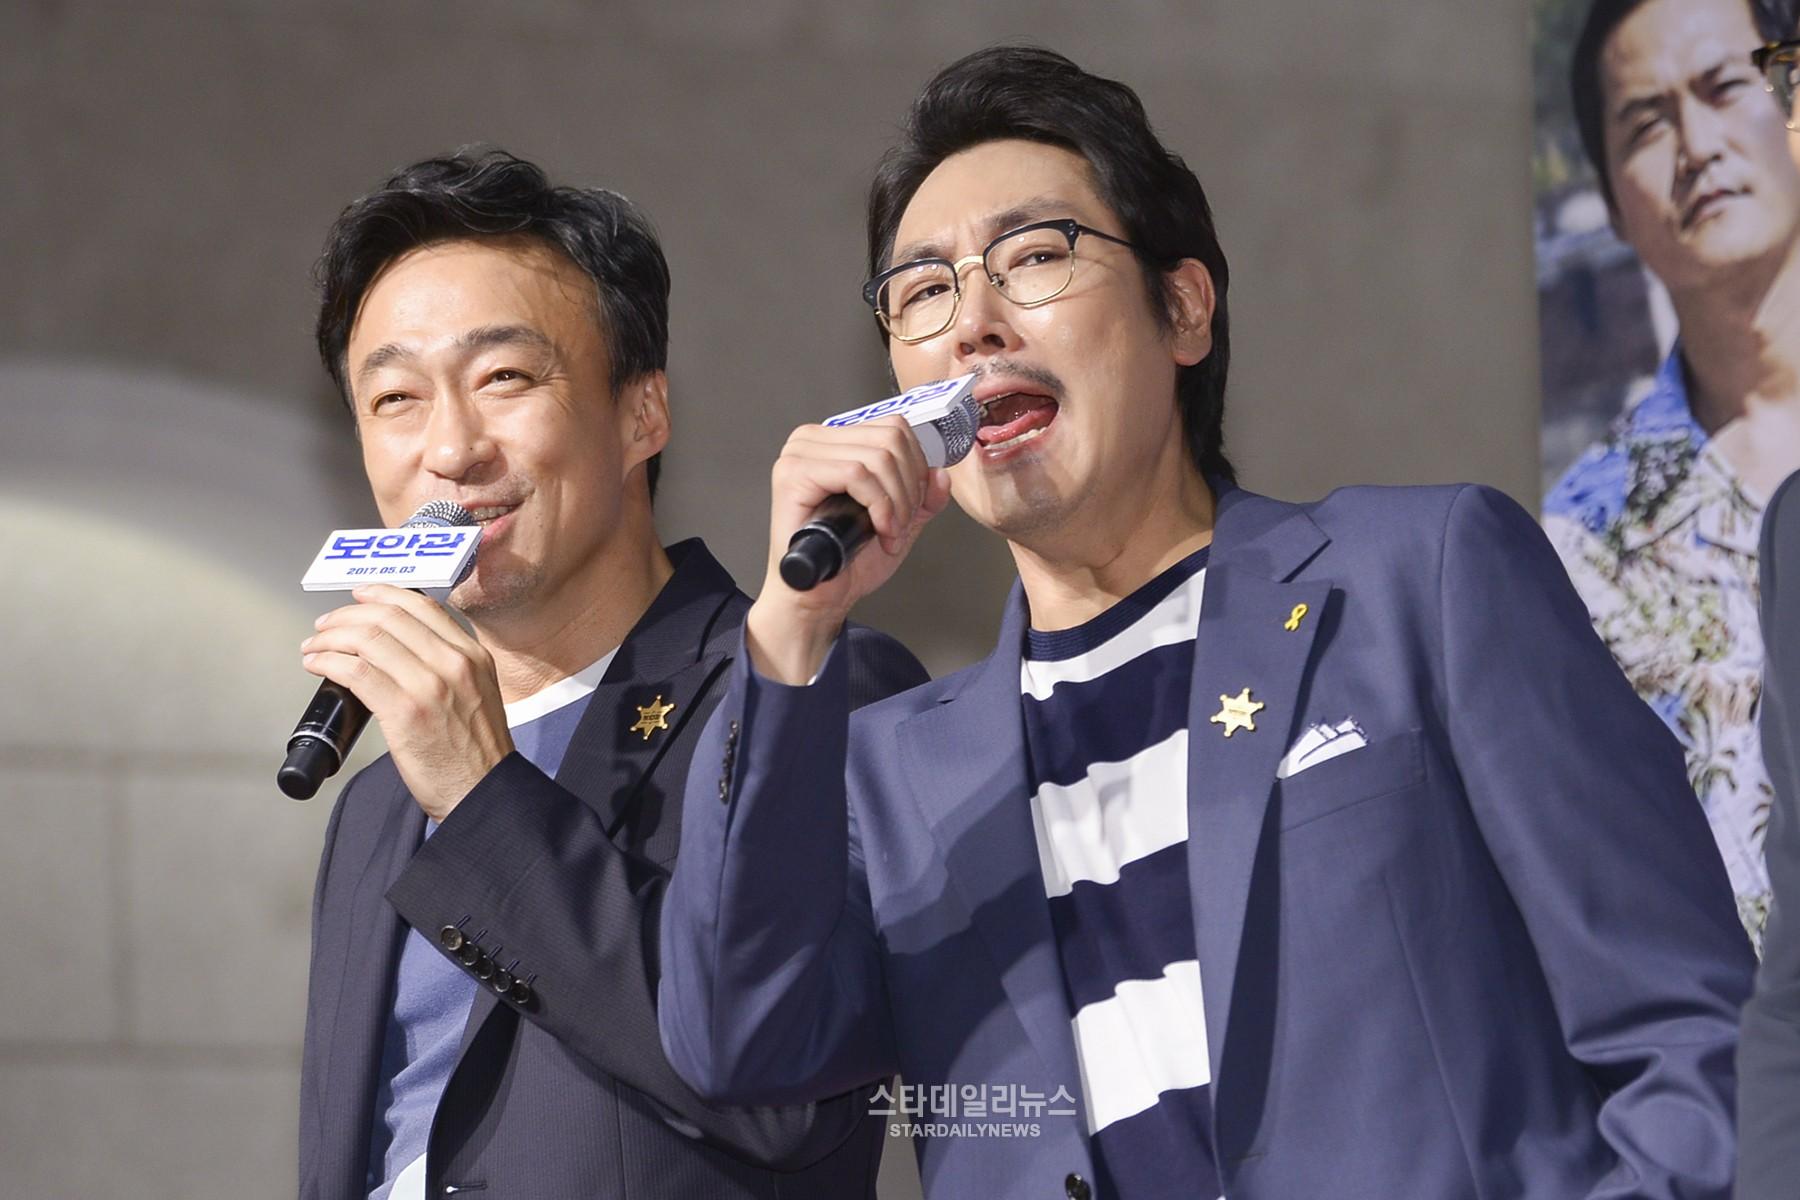 [S포토+] 이성민 조진웅, '소리질러~' (보안관 VIP 시사회)